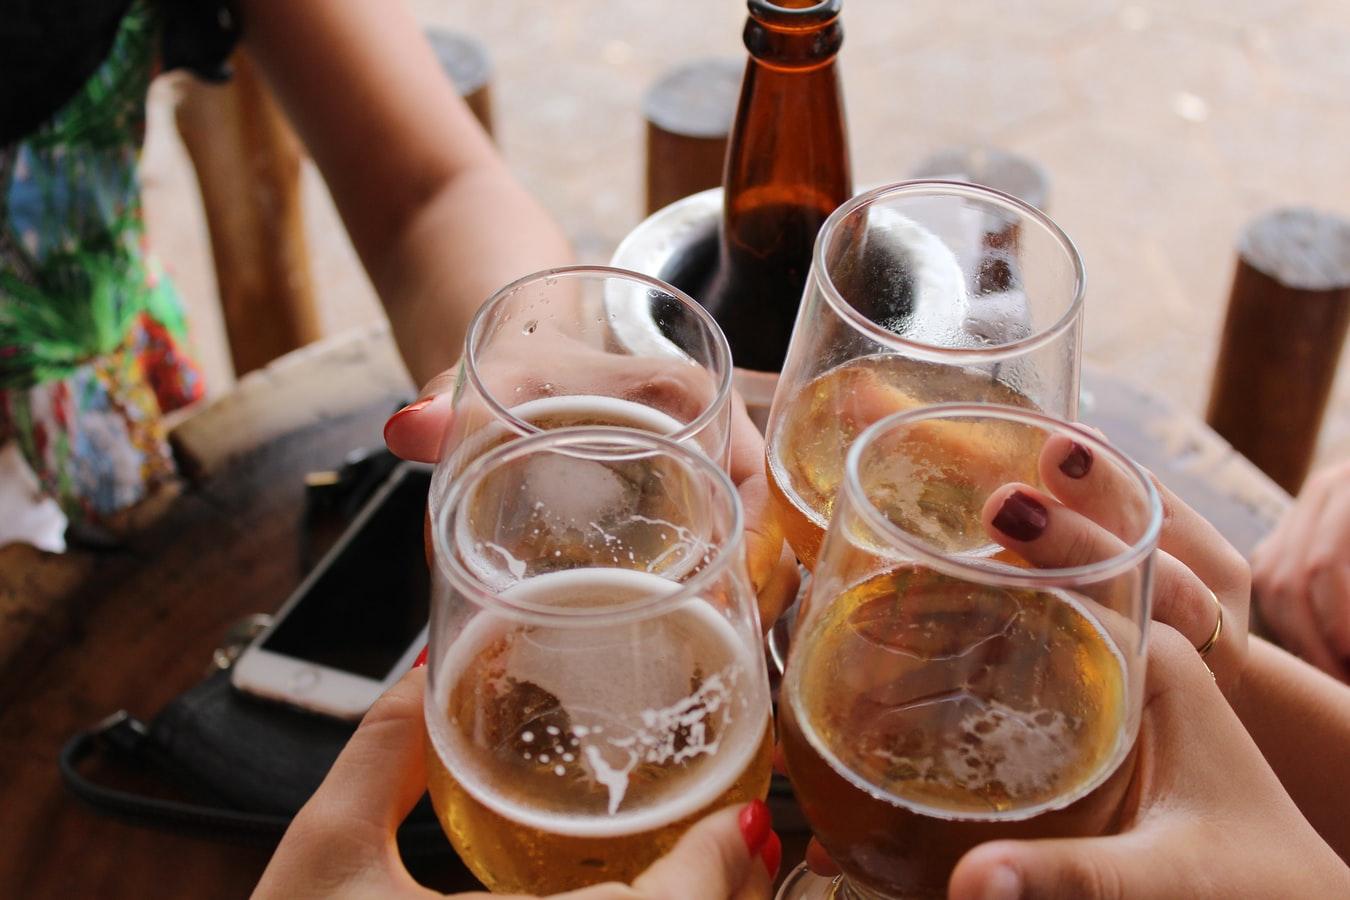 soco taphouse and brewery san angelo texas